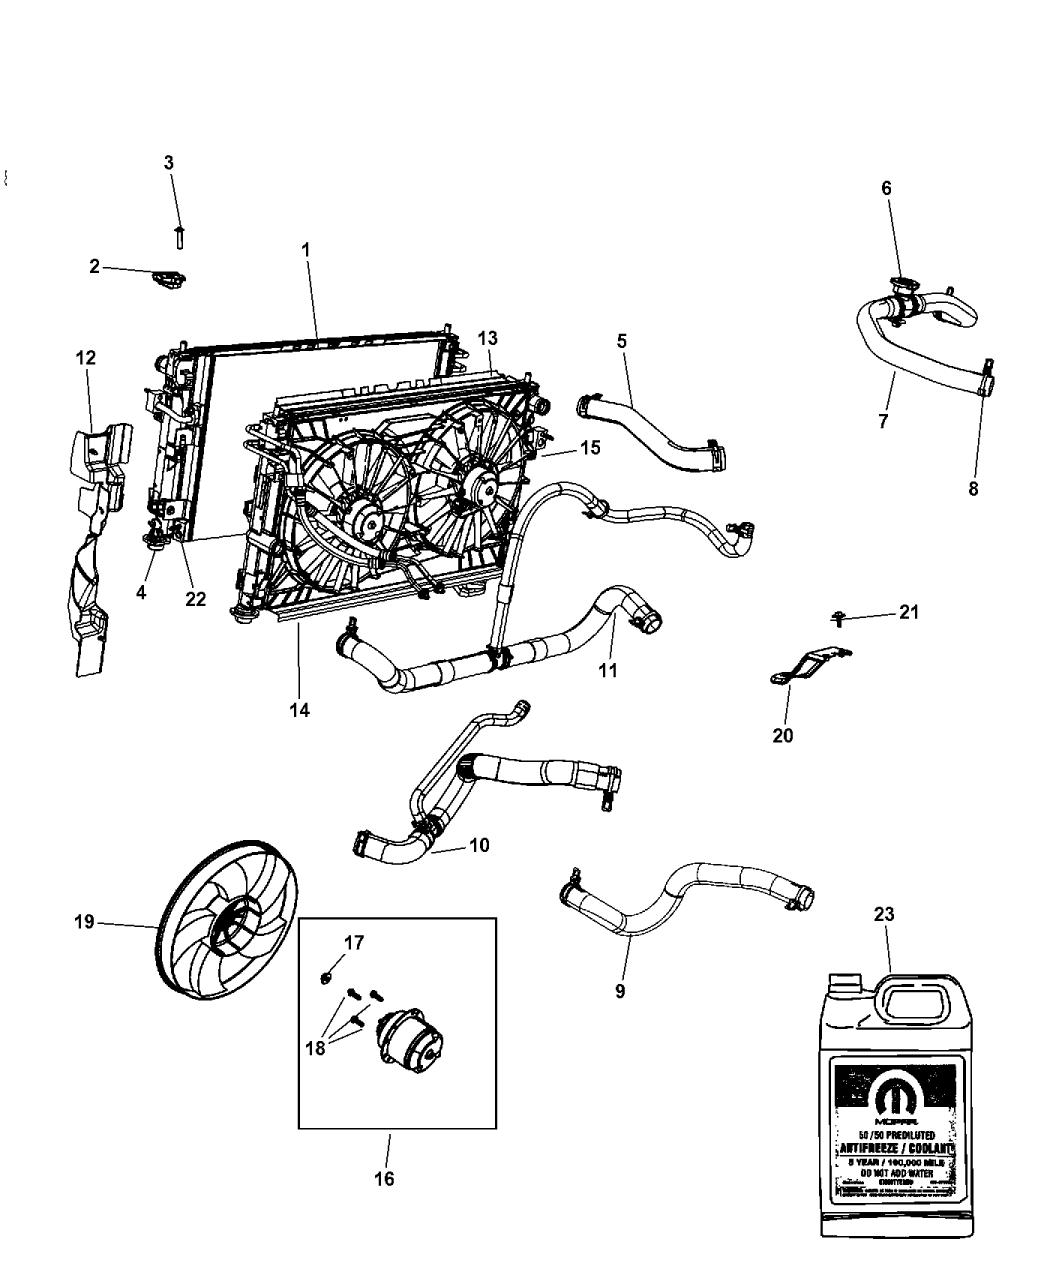 2013 chrysler 200 radiator & related parts - mopar parts giant chrysler engine cooling diagram